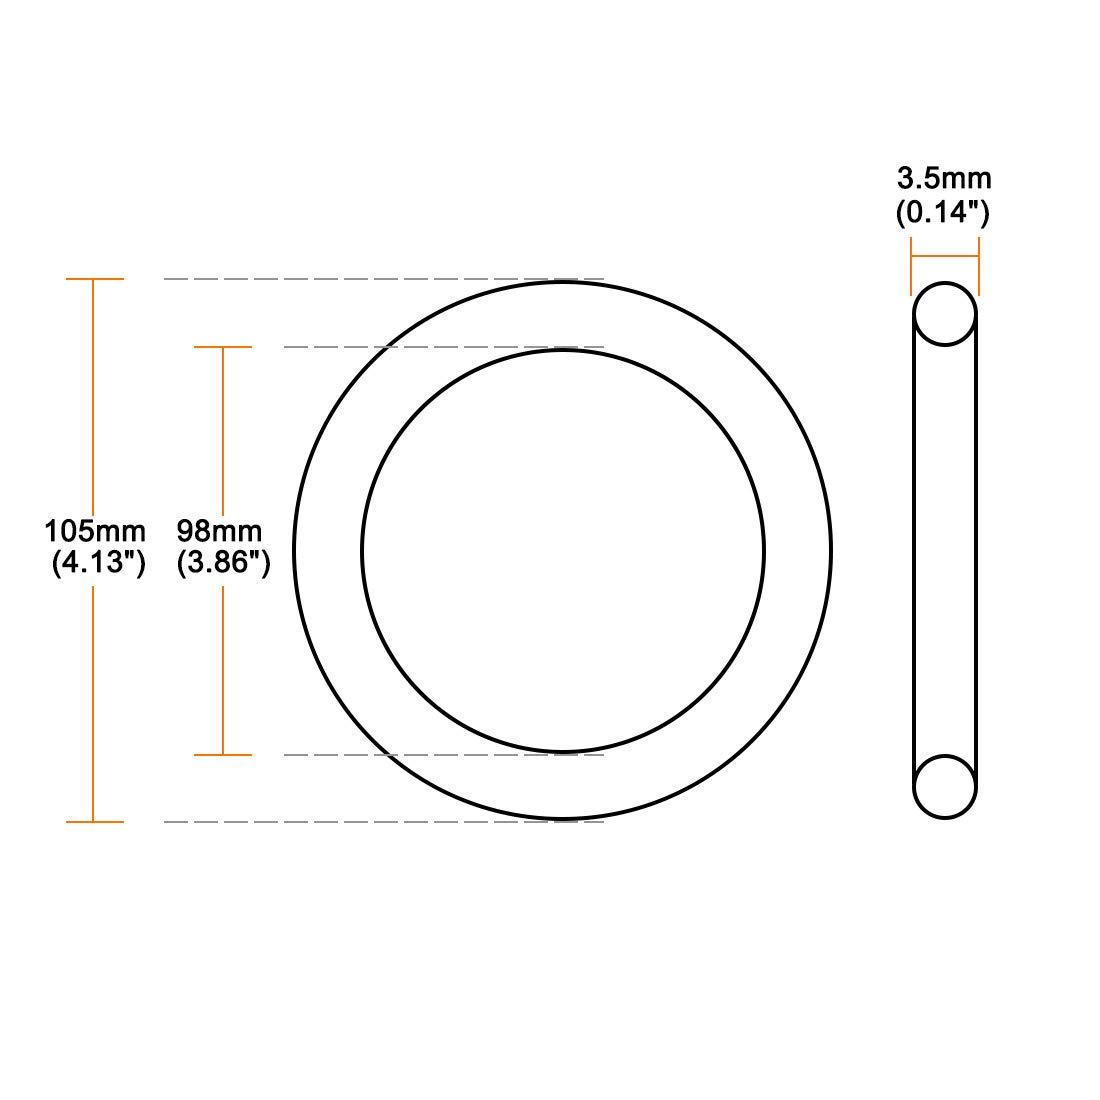 Joint torique caoutchouc nitrile ID 63mm OD 70mm large 3.5mm joint rond 5pc